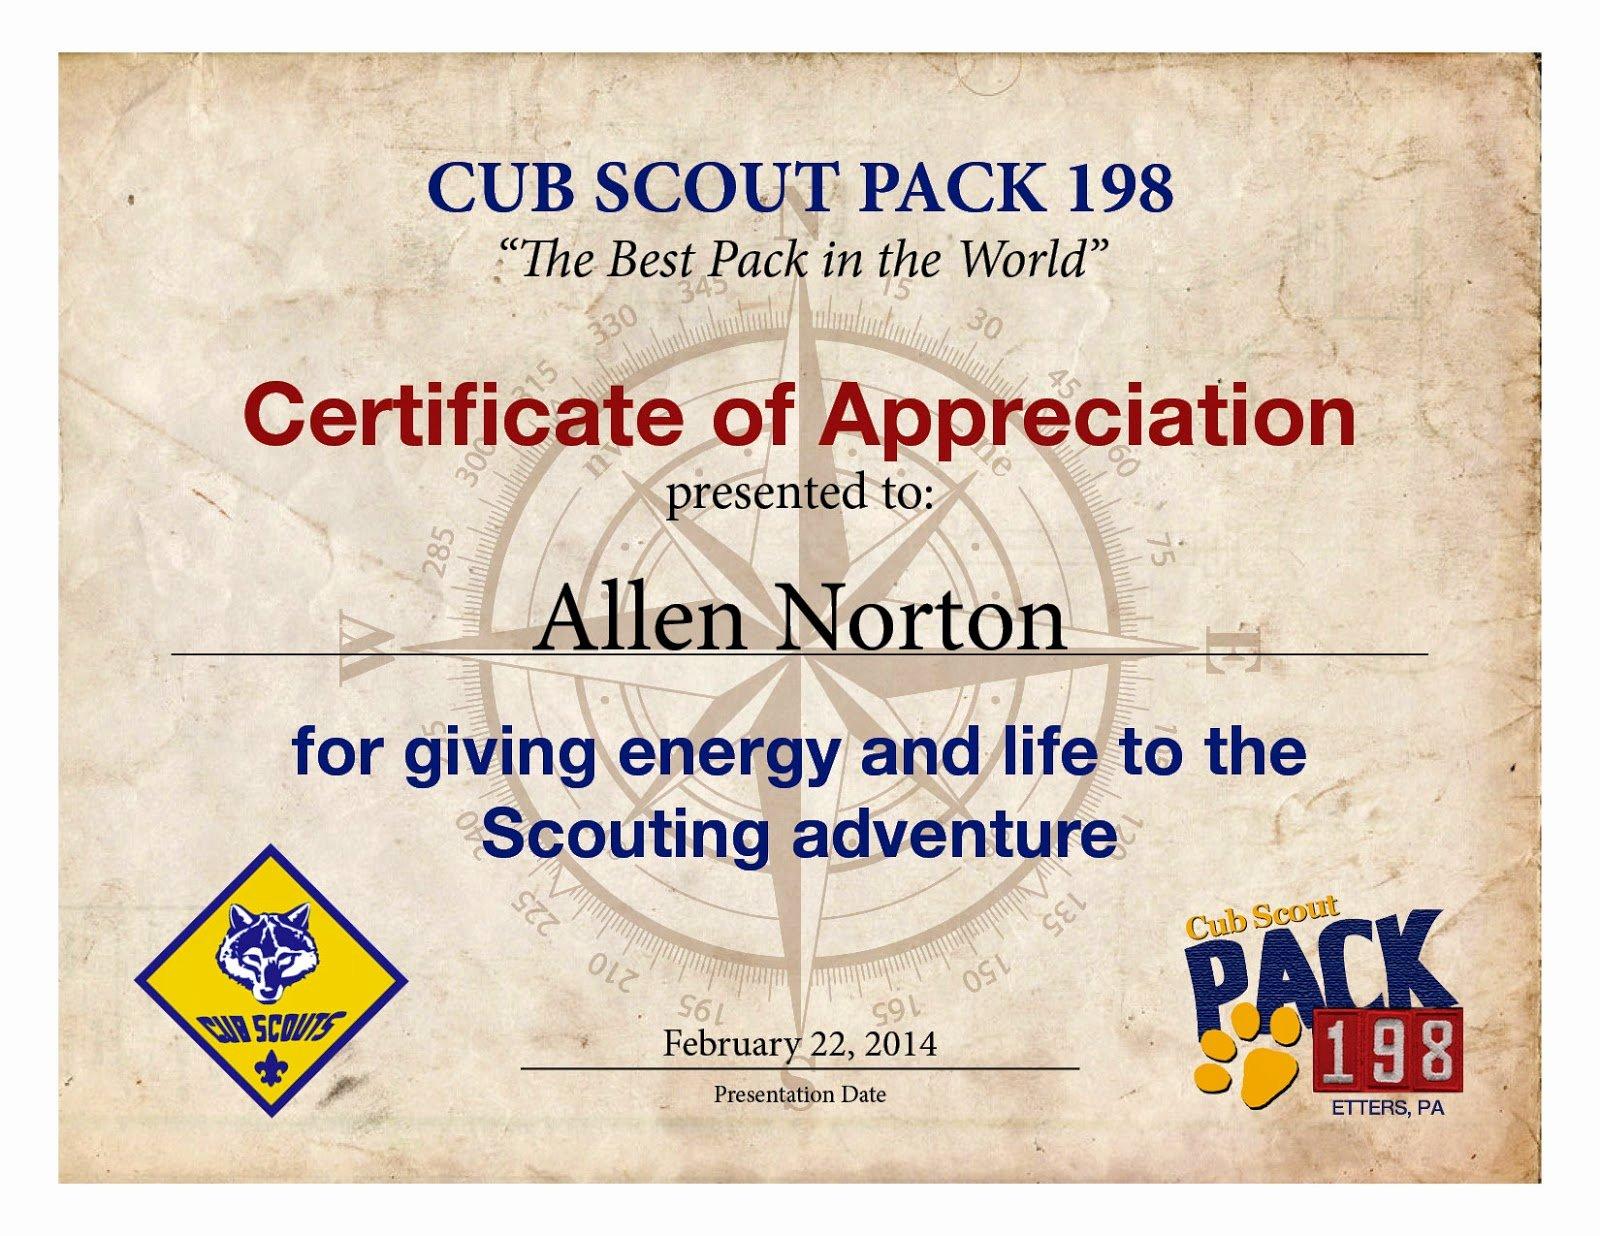 Cub Scout Certificate Of Appreciation Template Inspirational Bryson Design Studio July 2014